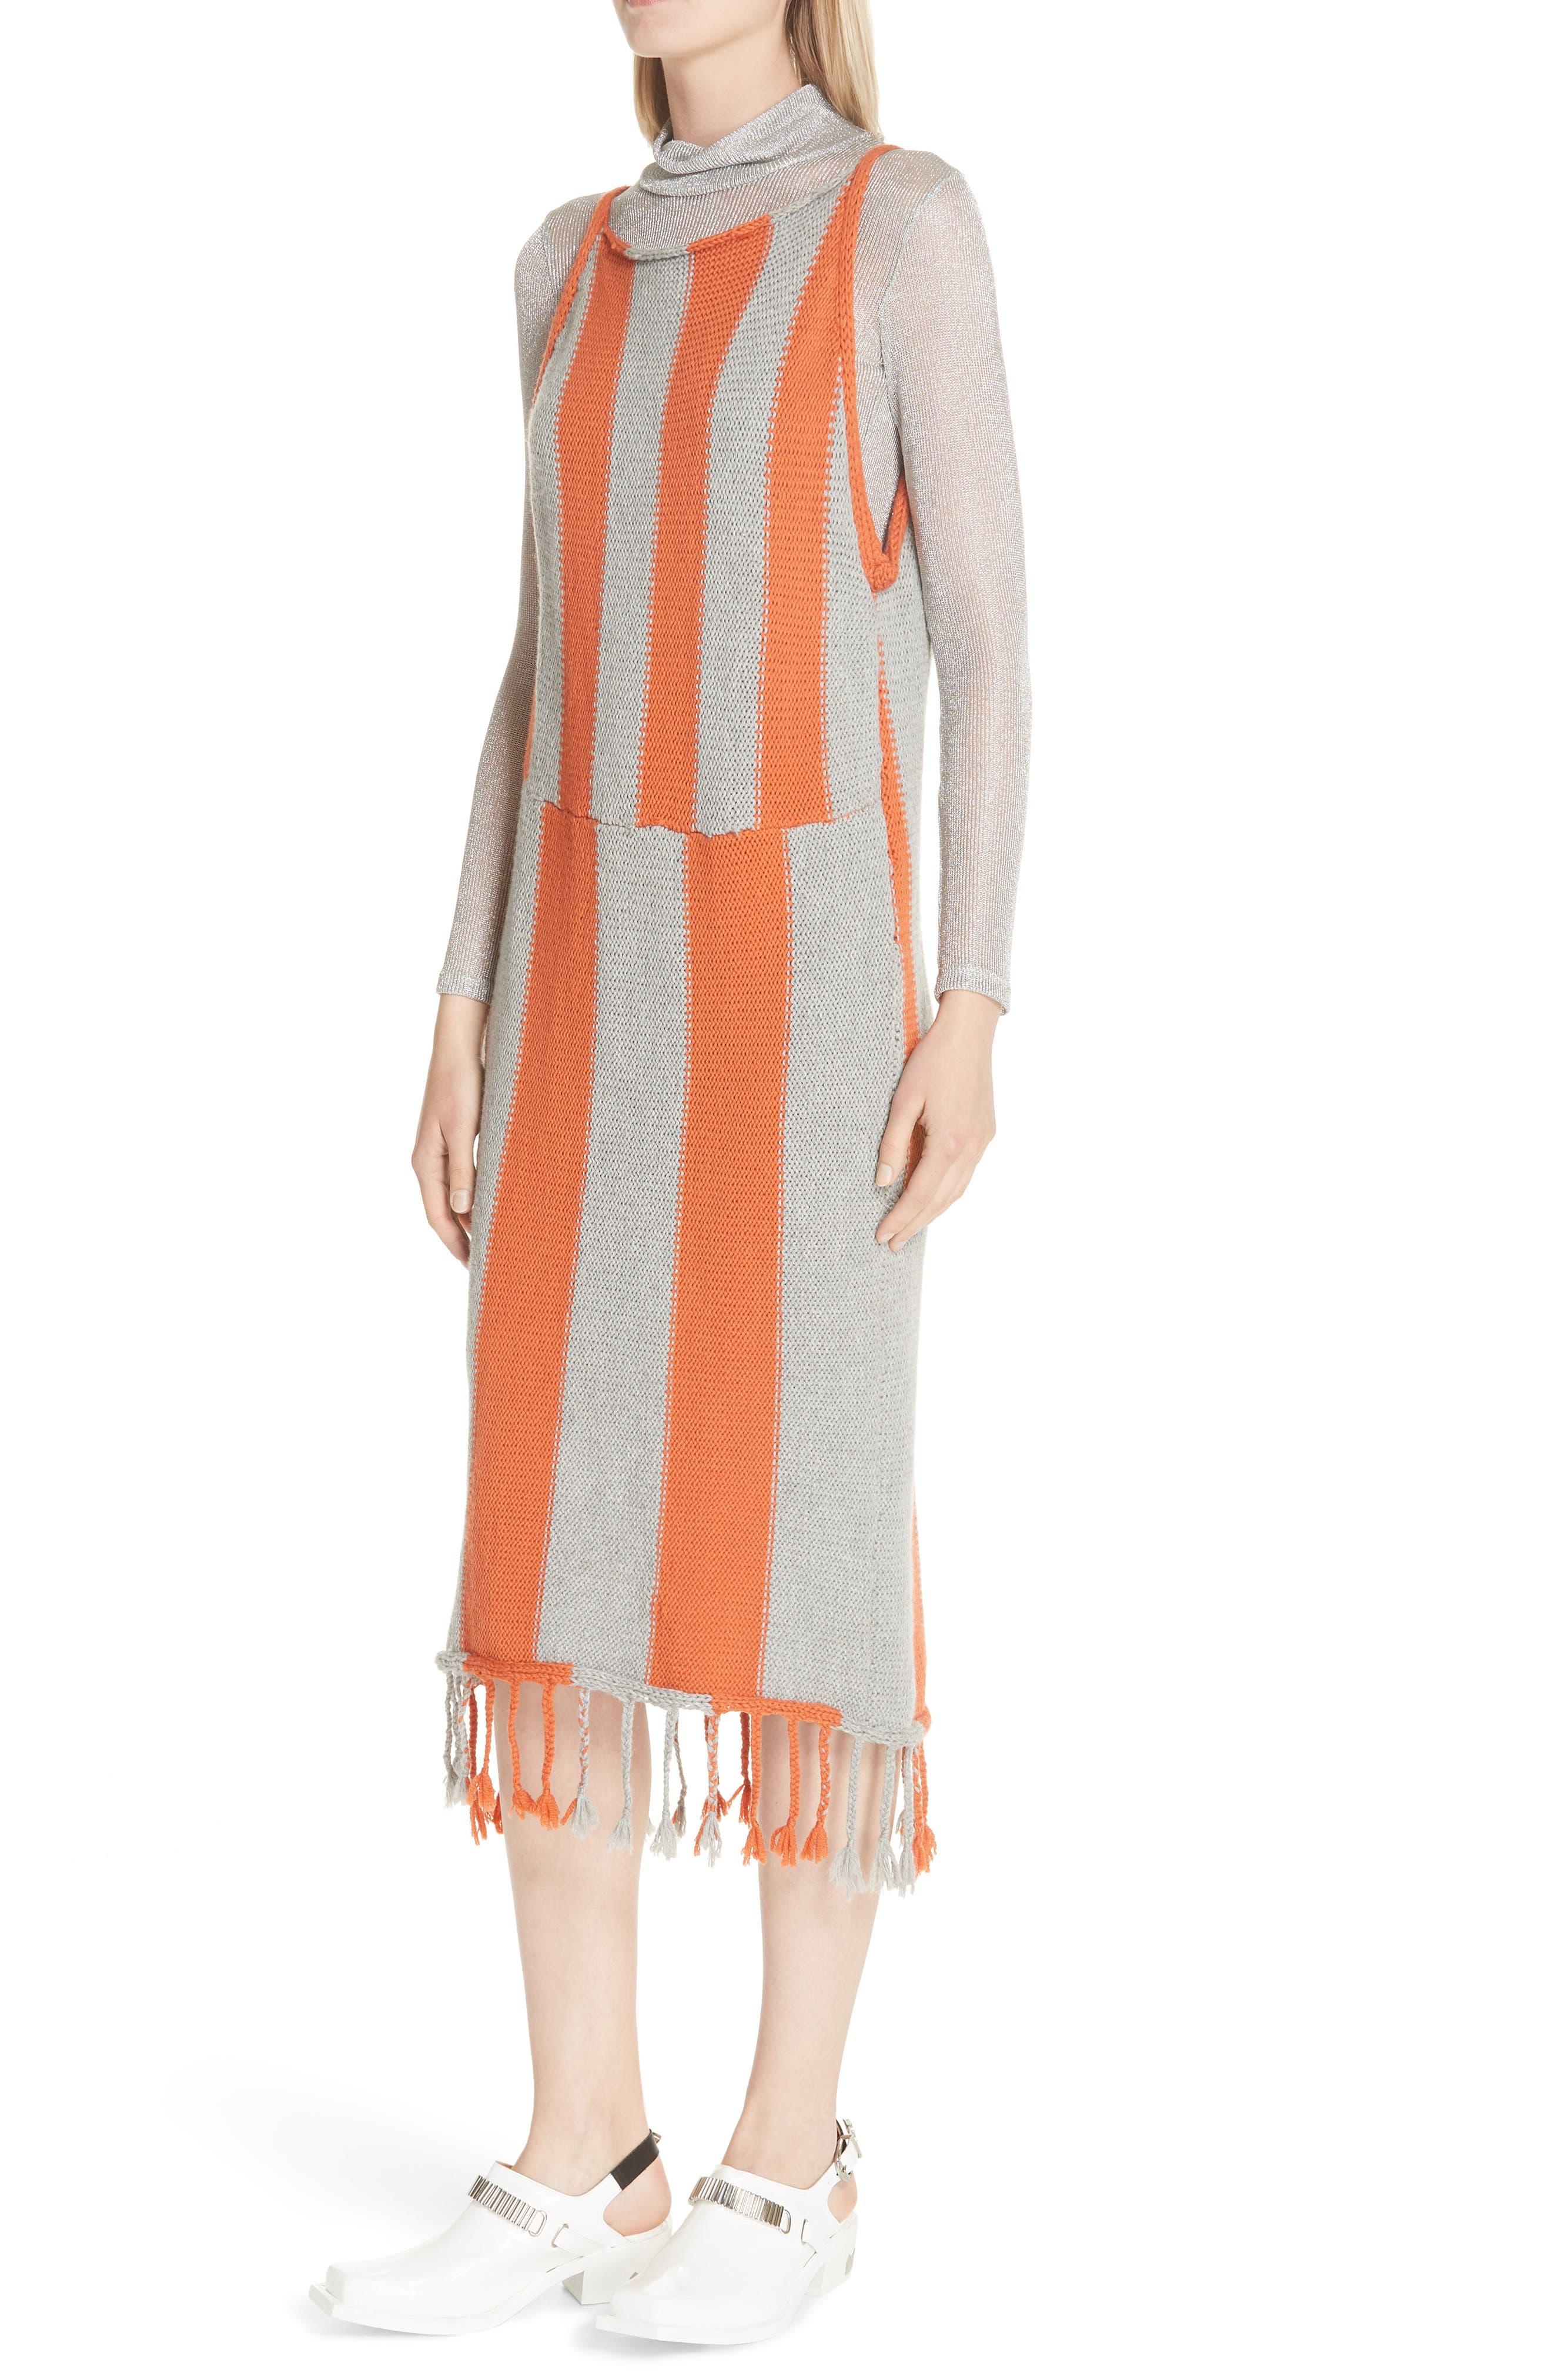 Stripe Tassel Hem Sweater Dress,                             Alternate thumbnail 4, color,                             GROG - GREY ORANGE